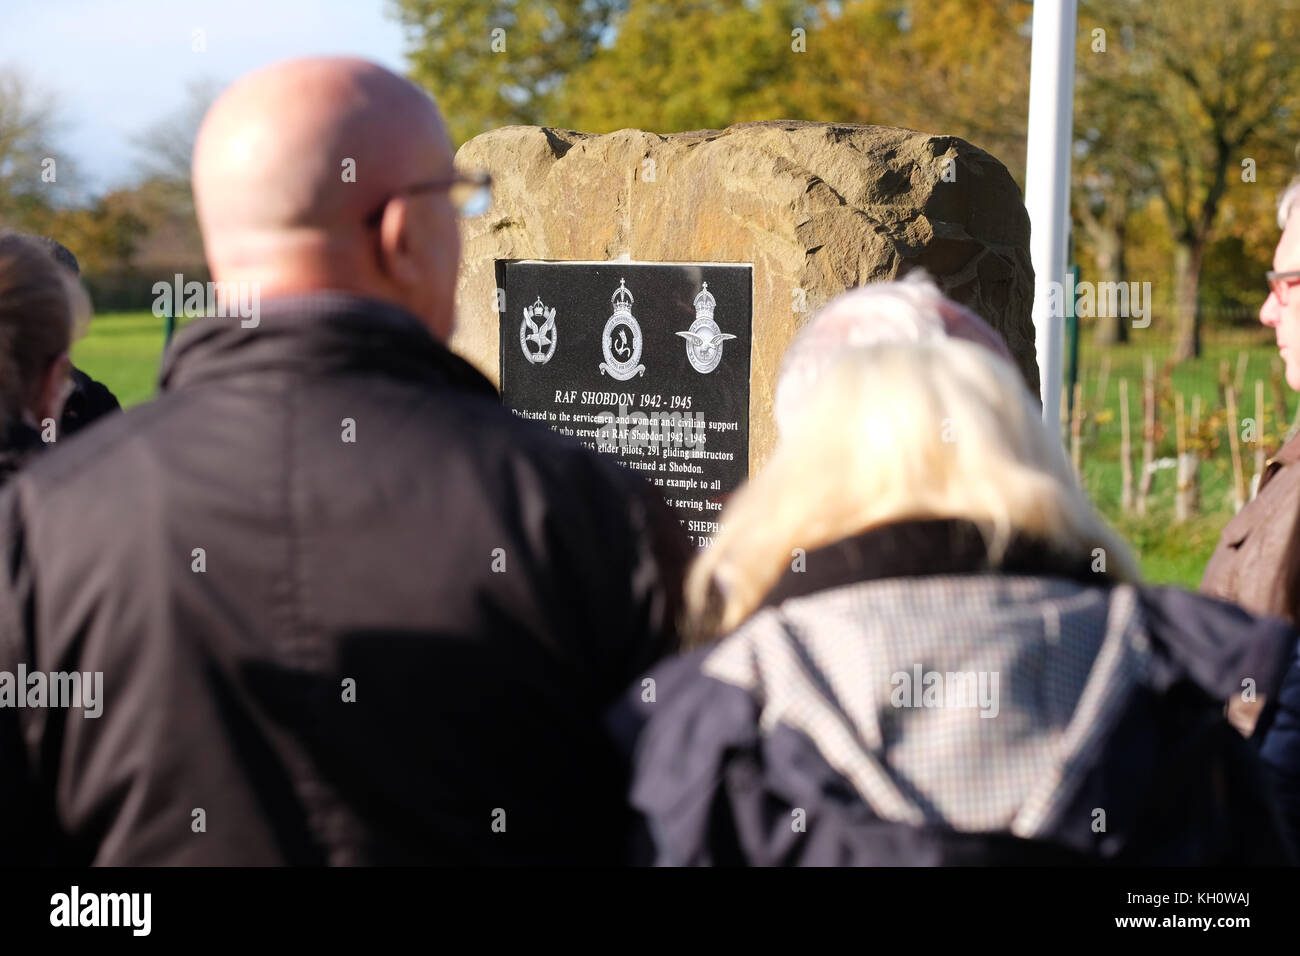 Shobdon airfield, Herefordshire, UK - Sunday 12th November 2017 - Remembrance Sunday at the airfield at Shobdon - Stock Image